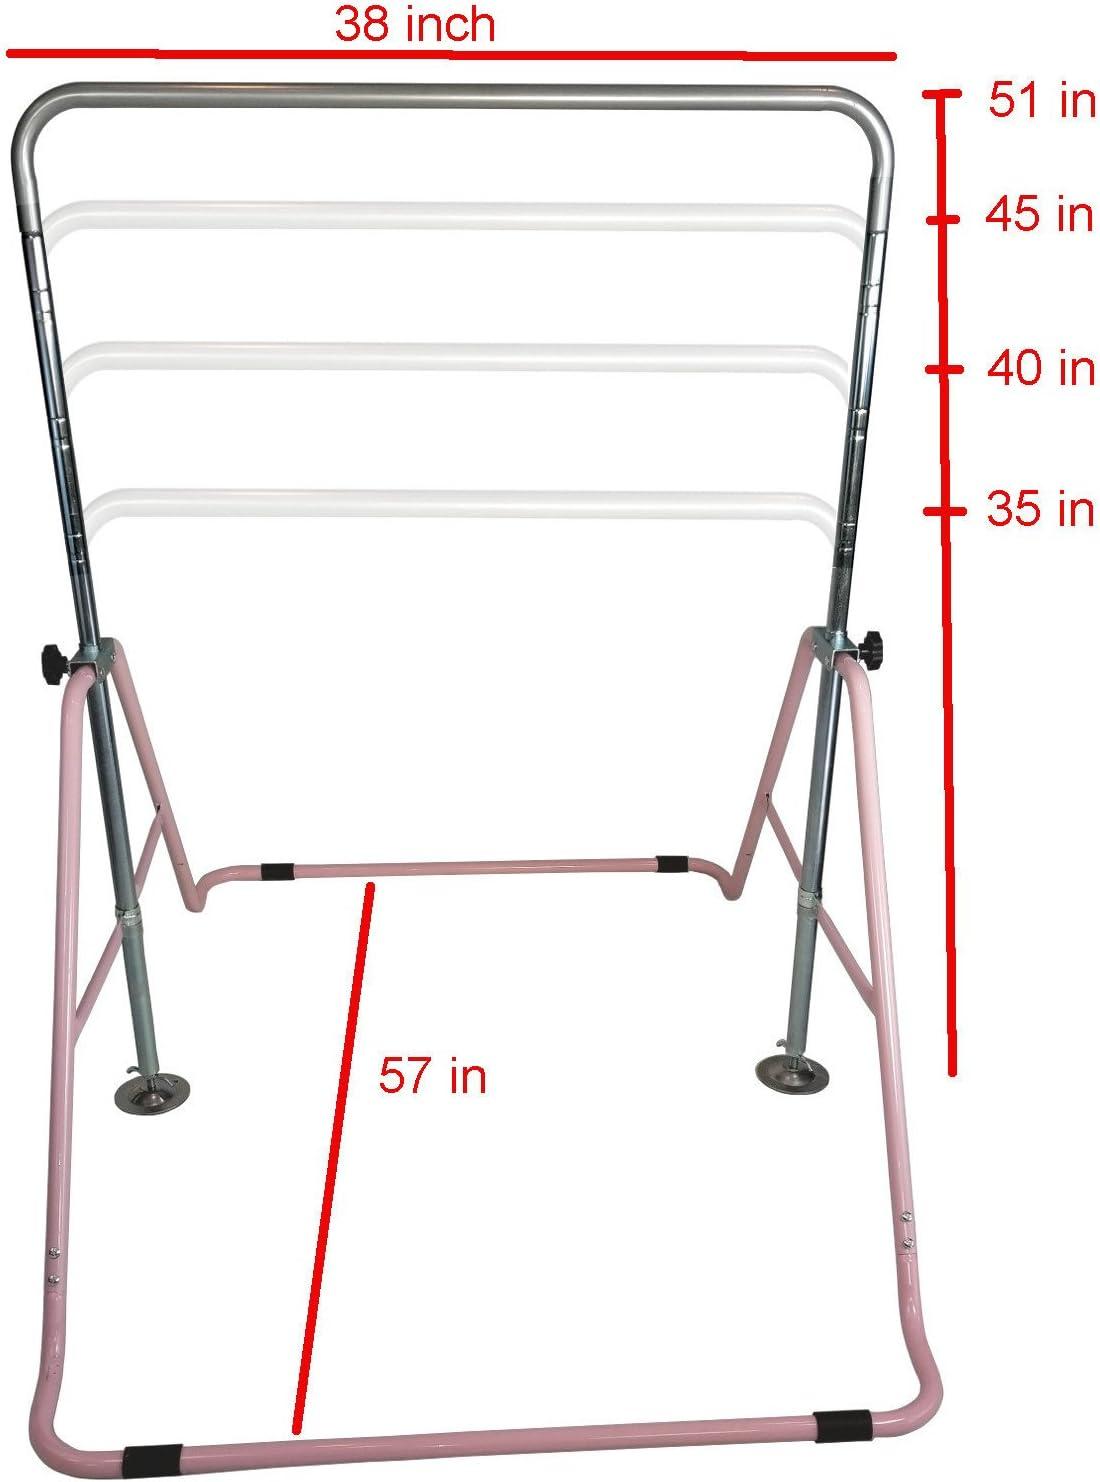 Max Load 170LBS TTwake Gymnastics Bar for Kids with Swing Seat Set Adjustable Height Folding Gymnastic Junior Training Bar Children Monkey Horizontal Bars